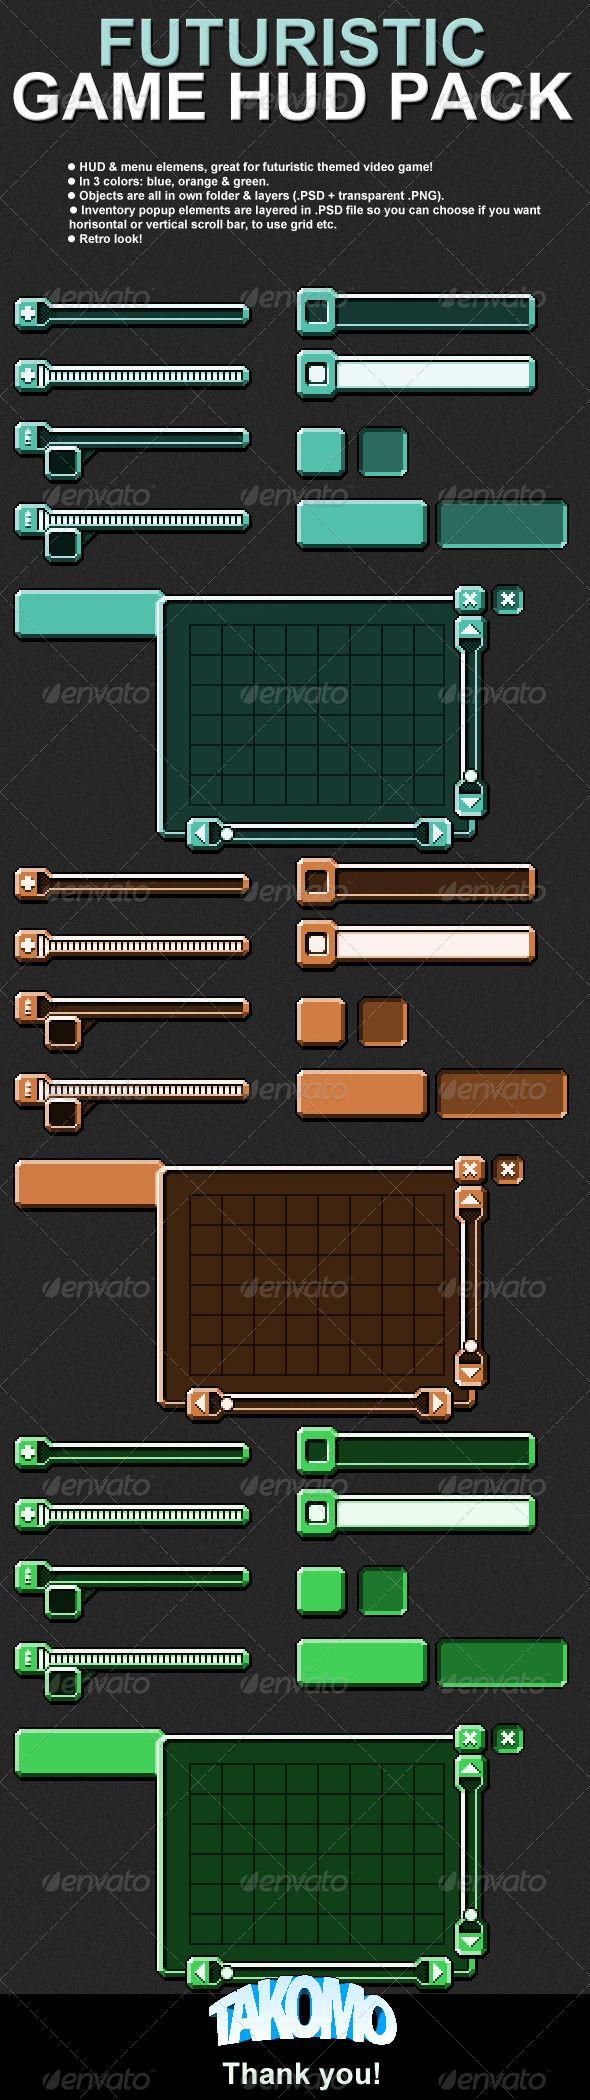 Futuristic Game HUD/Menu Pack Mobile Game User Interface Template PSD, Transparent PNG. Download here: http://graphicriver.net/item/futuristic-game-hudmenu-pack/3822761?s_rank=306&ref=yinkira